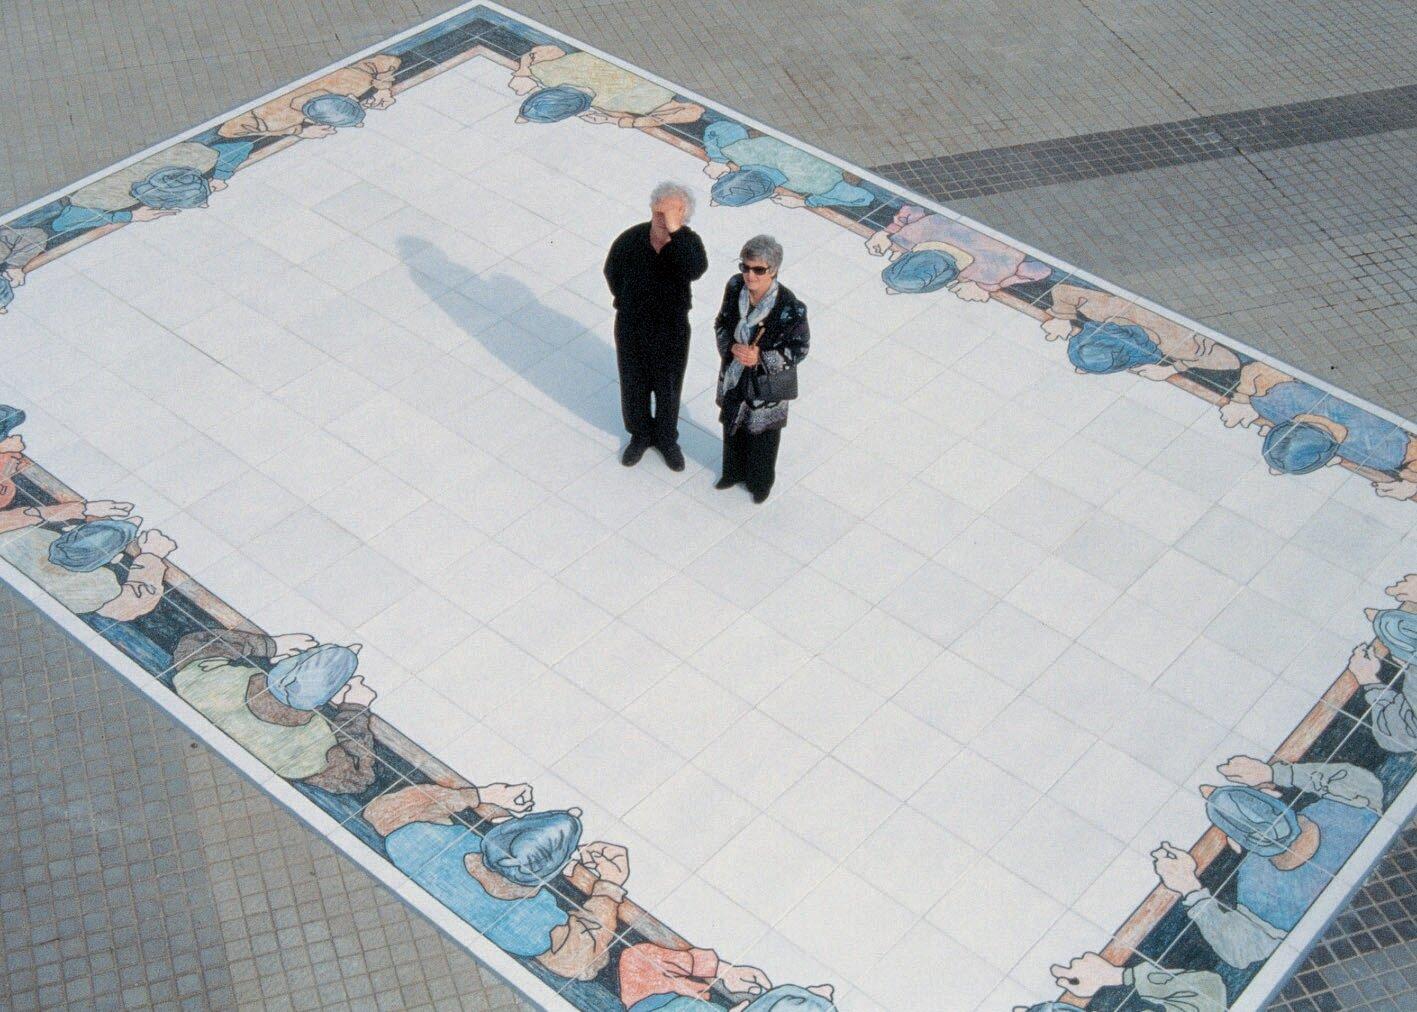 View-of-installation-Ilya-and-Emilia-Kabakov-on-the-Shirakawa-Park-Sculpture-Promenade-.jpg